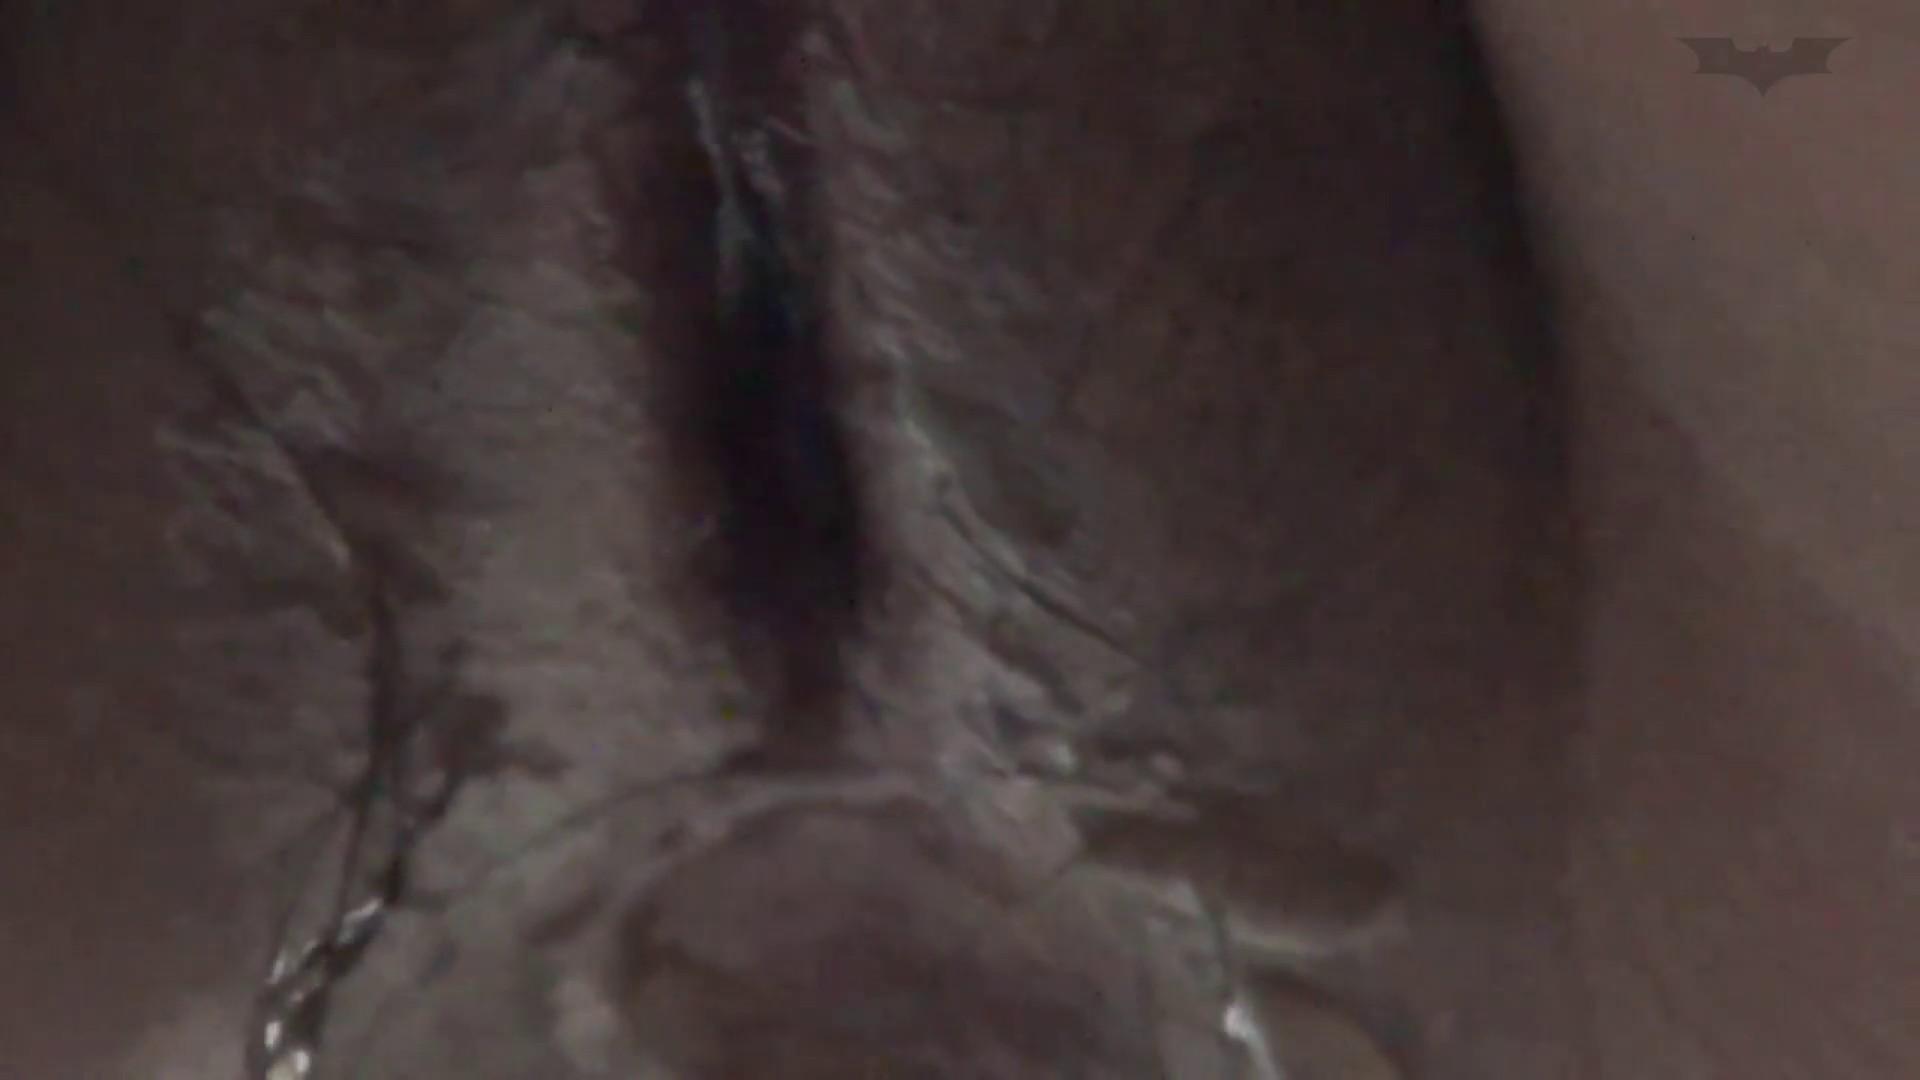 JD盗撮 美女の洗面所の秘密 Vol.44 盗撮  98pic 55